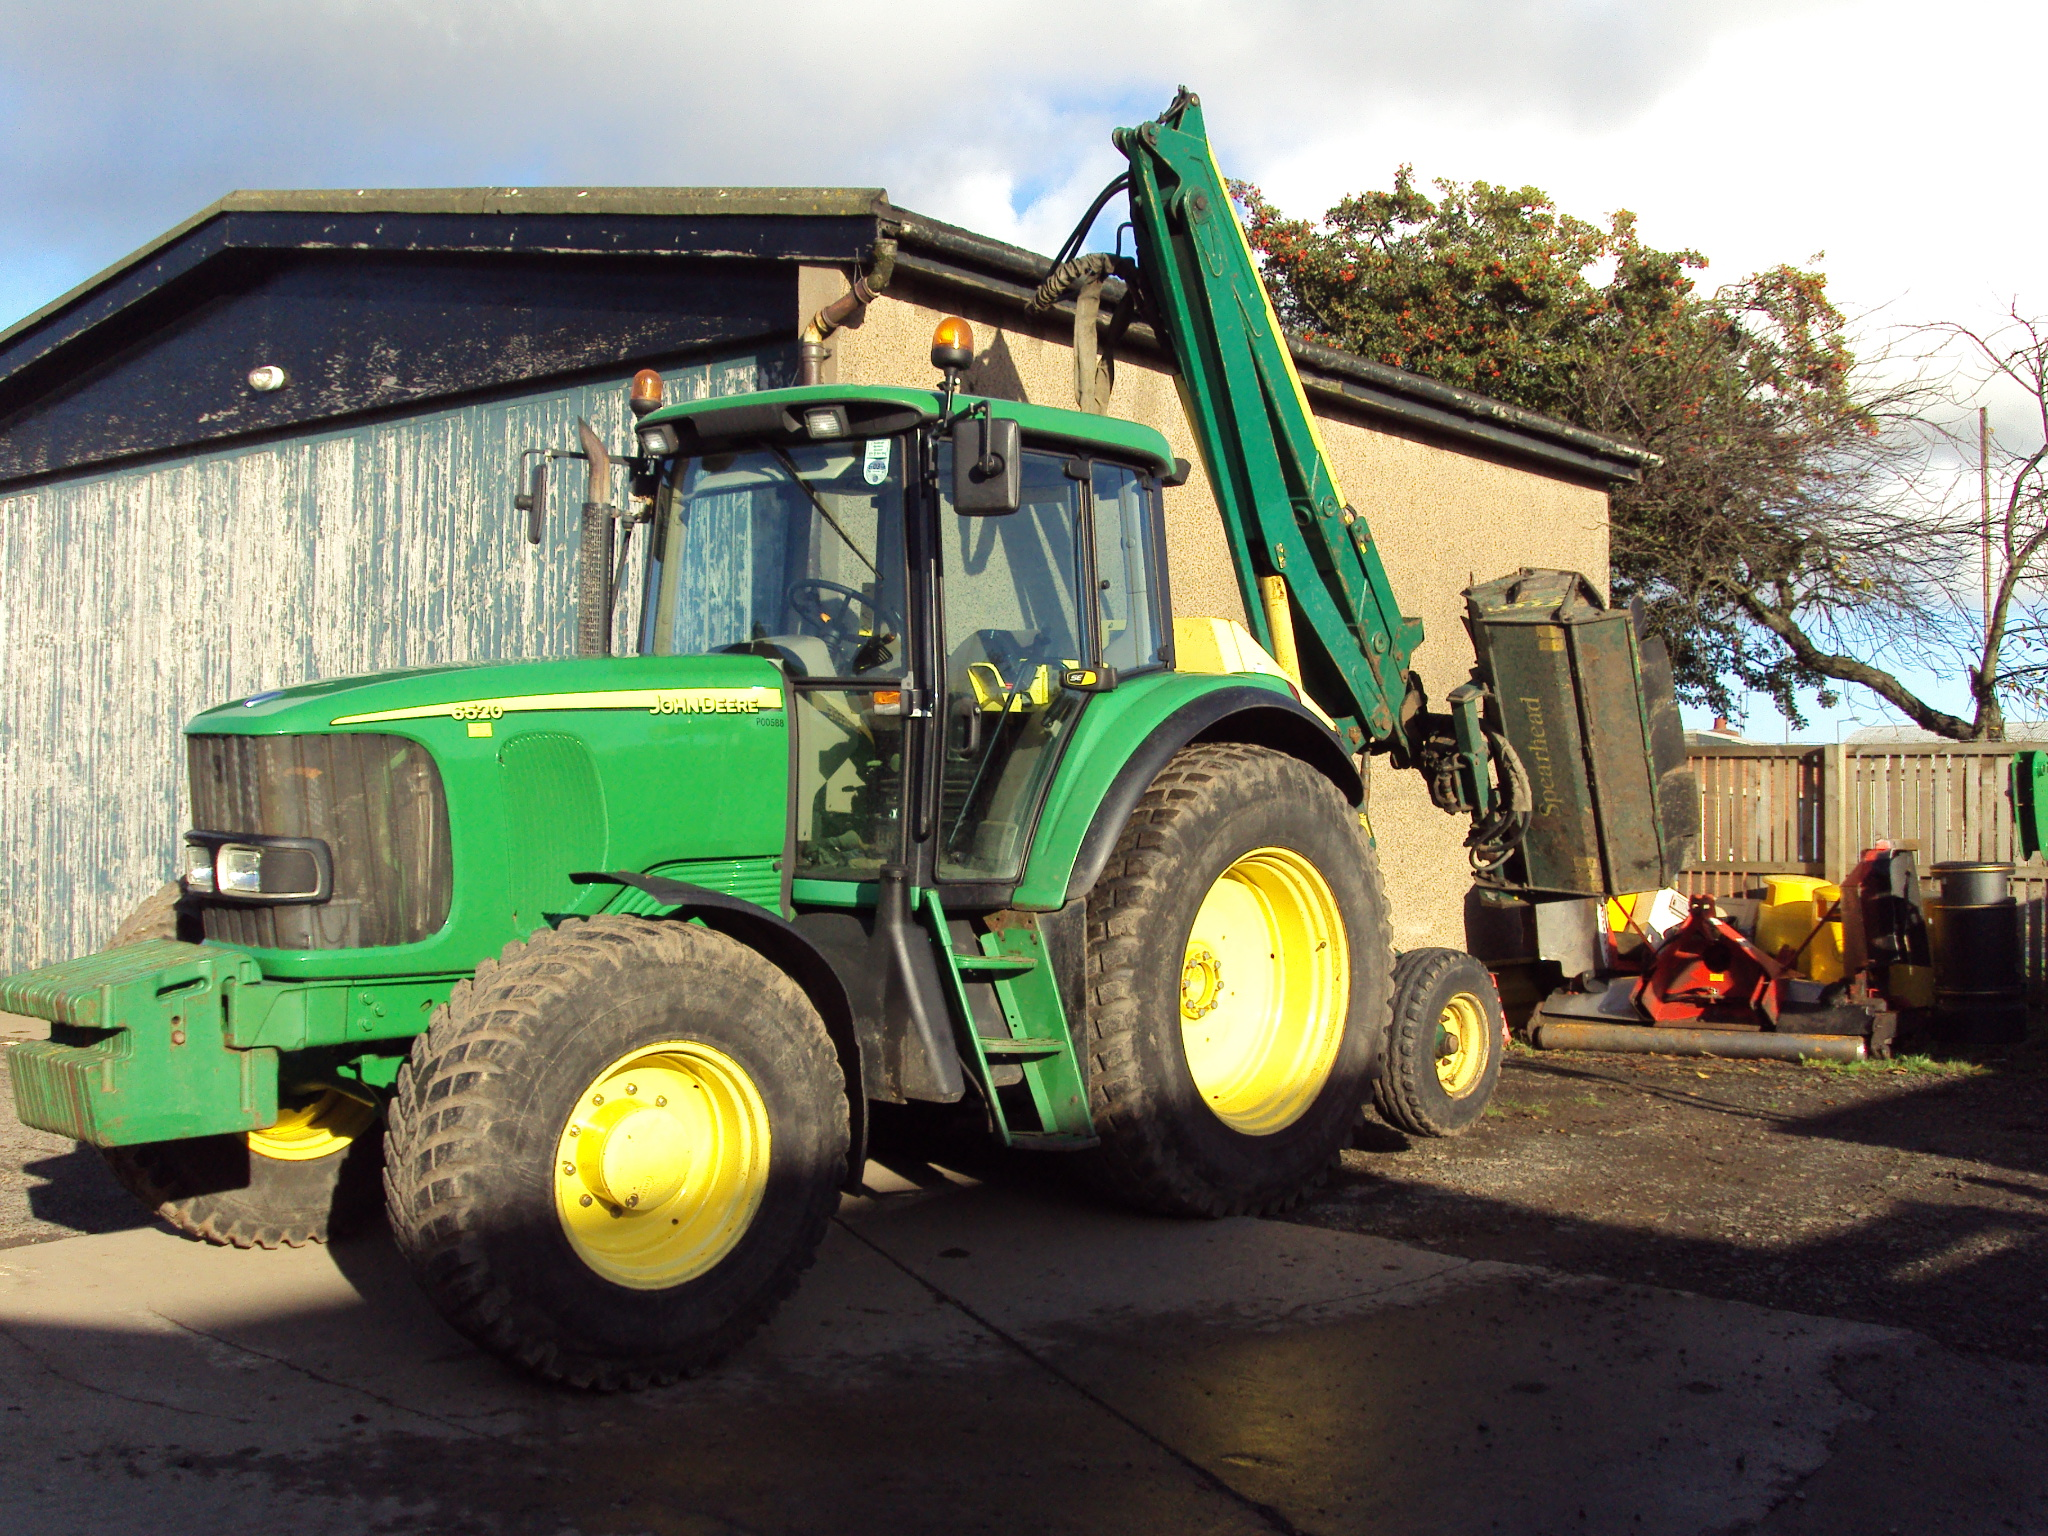 john deere 6520 se - tractor & construction plant wiki